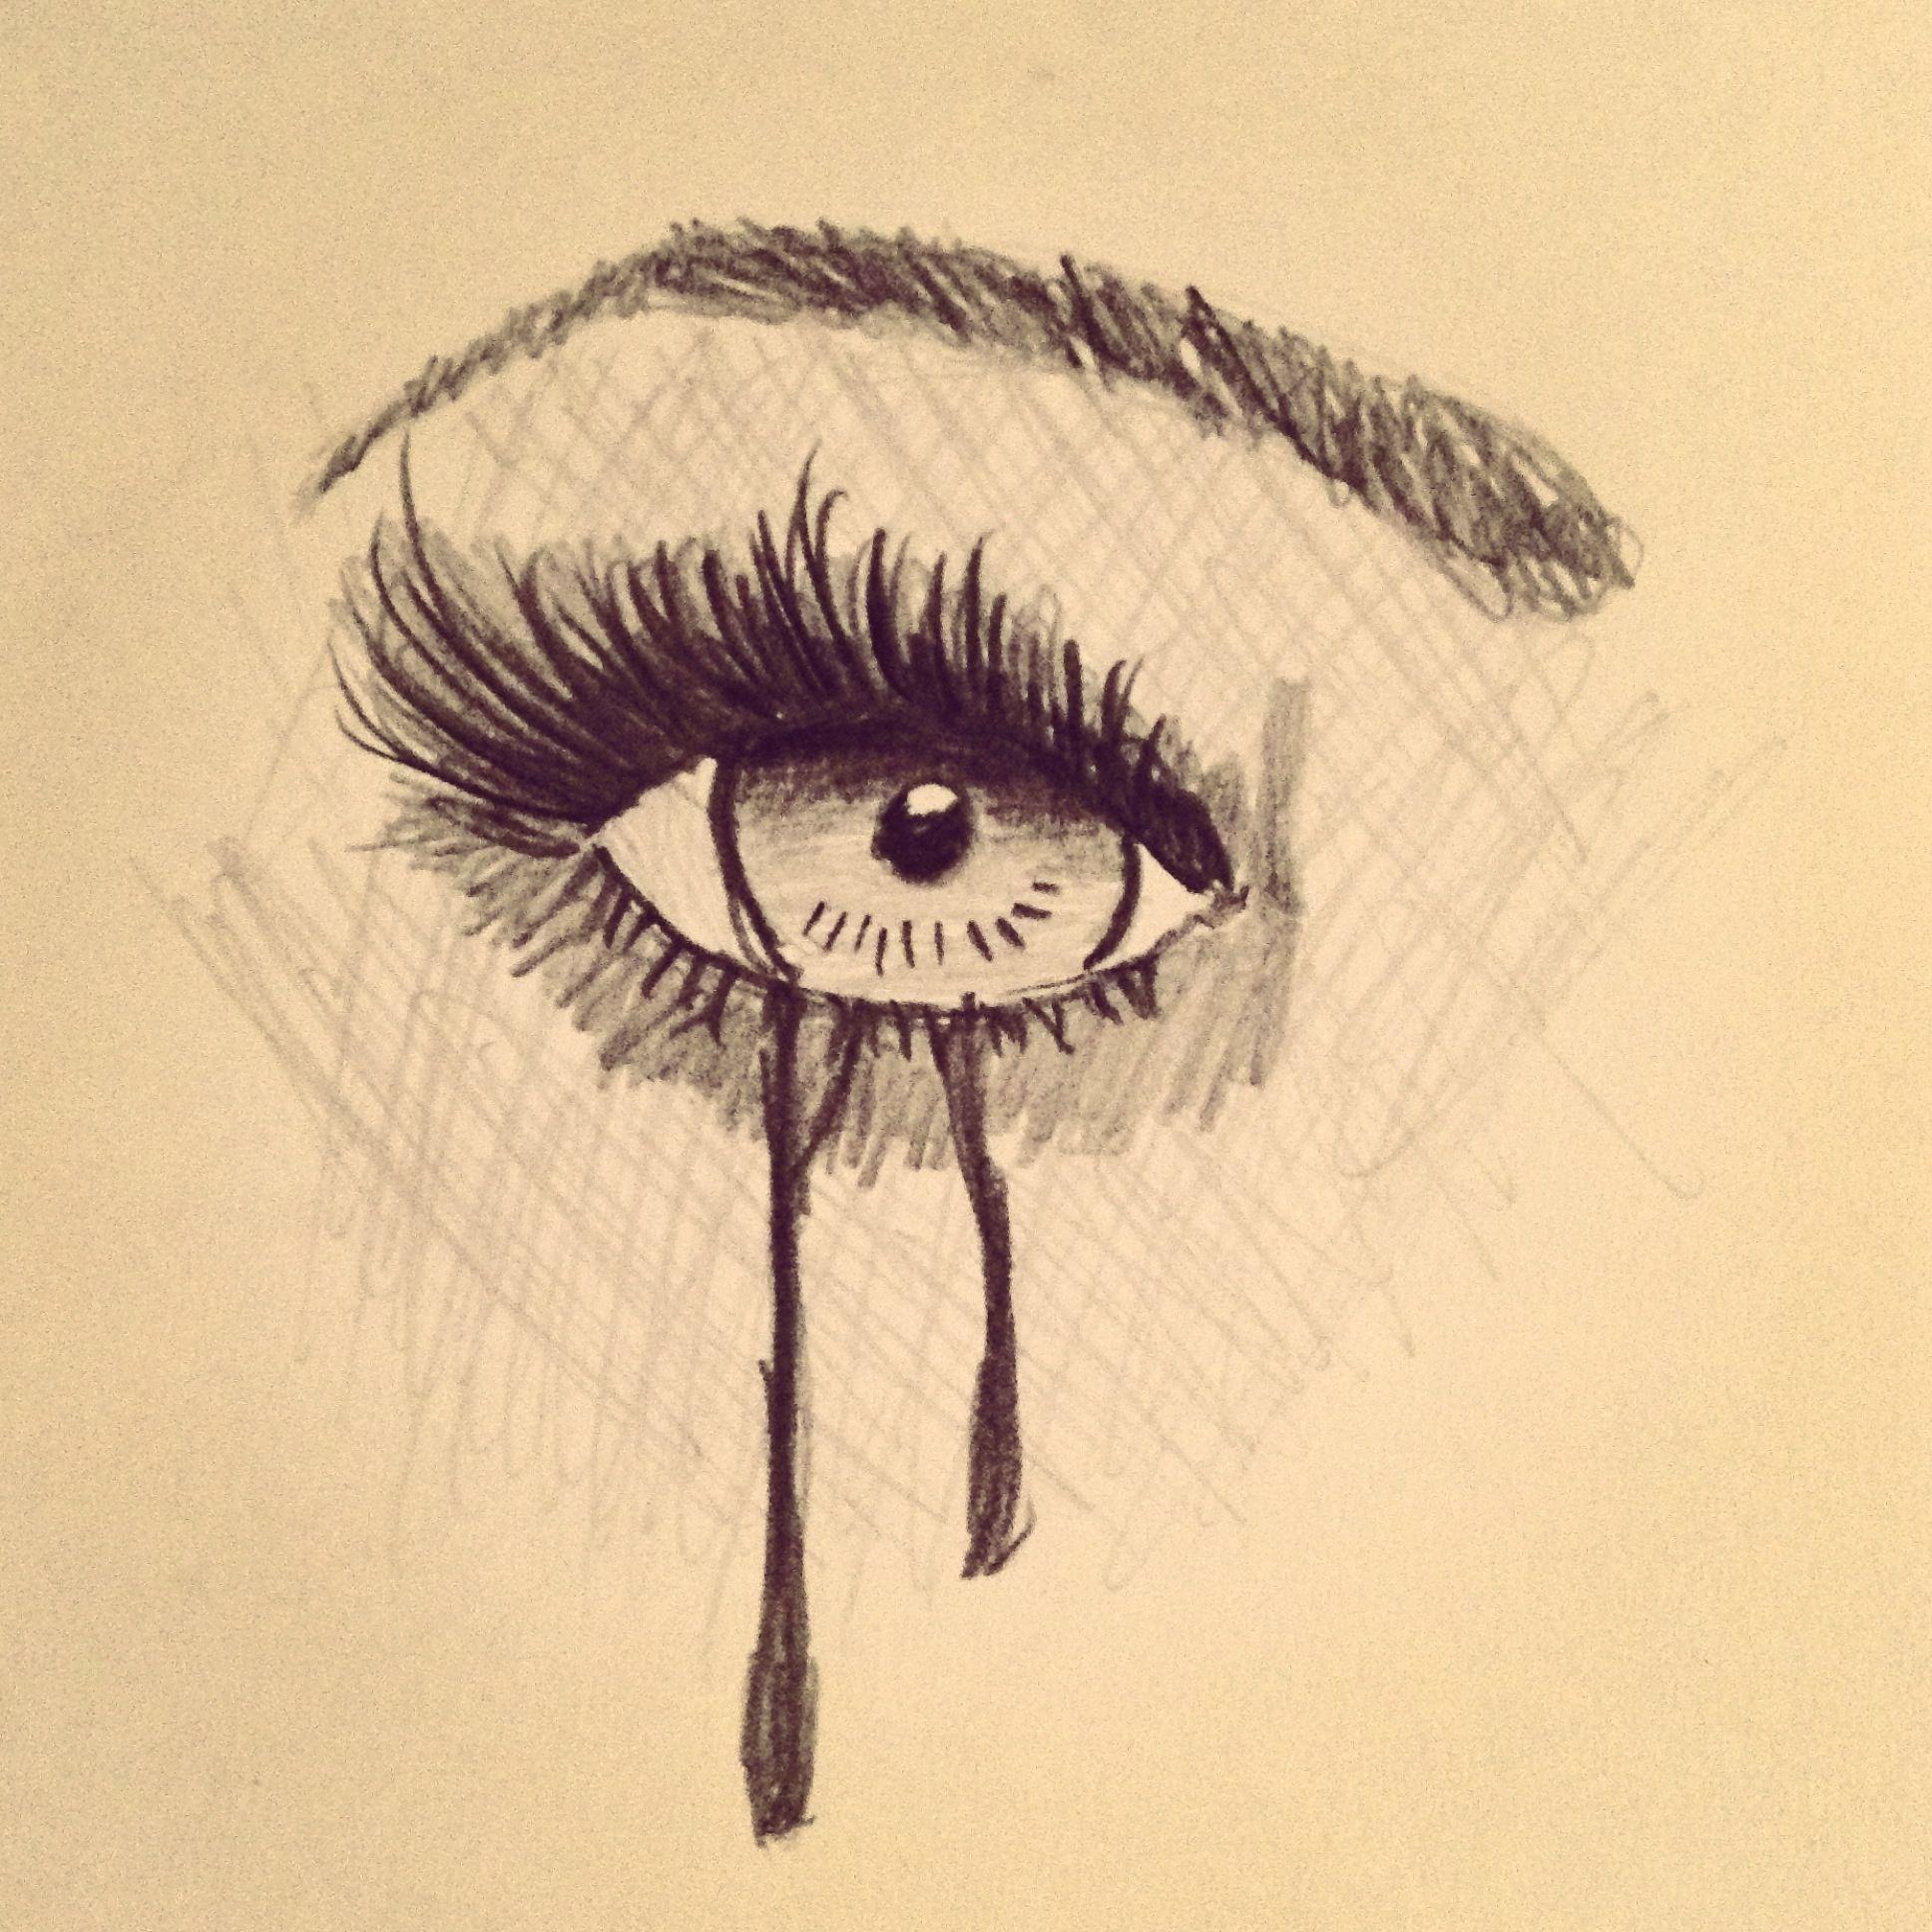 Crying eye drawing by Maul McCartney (c) | Art I drew ...